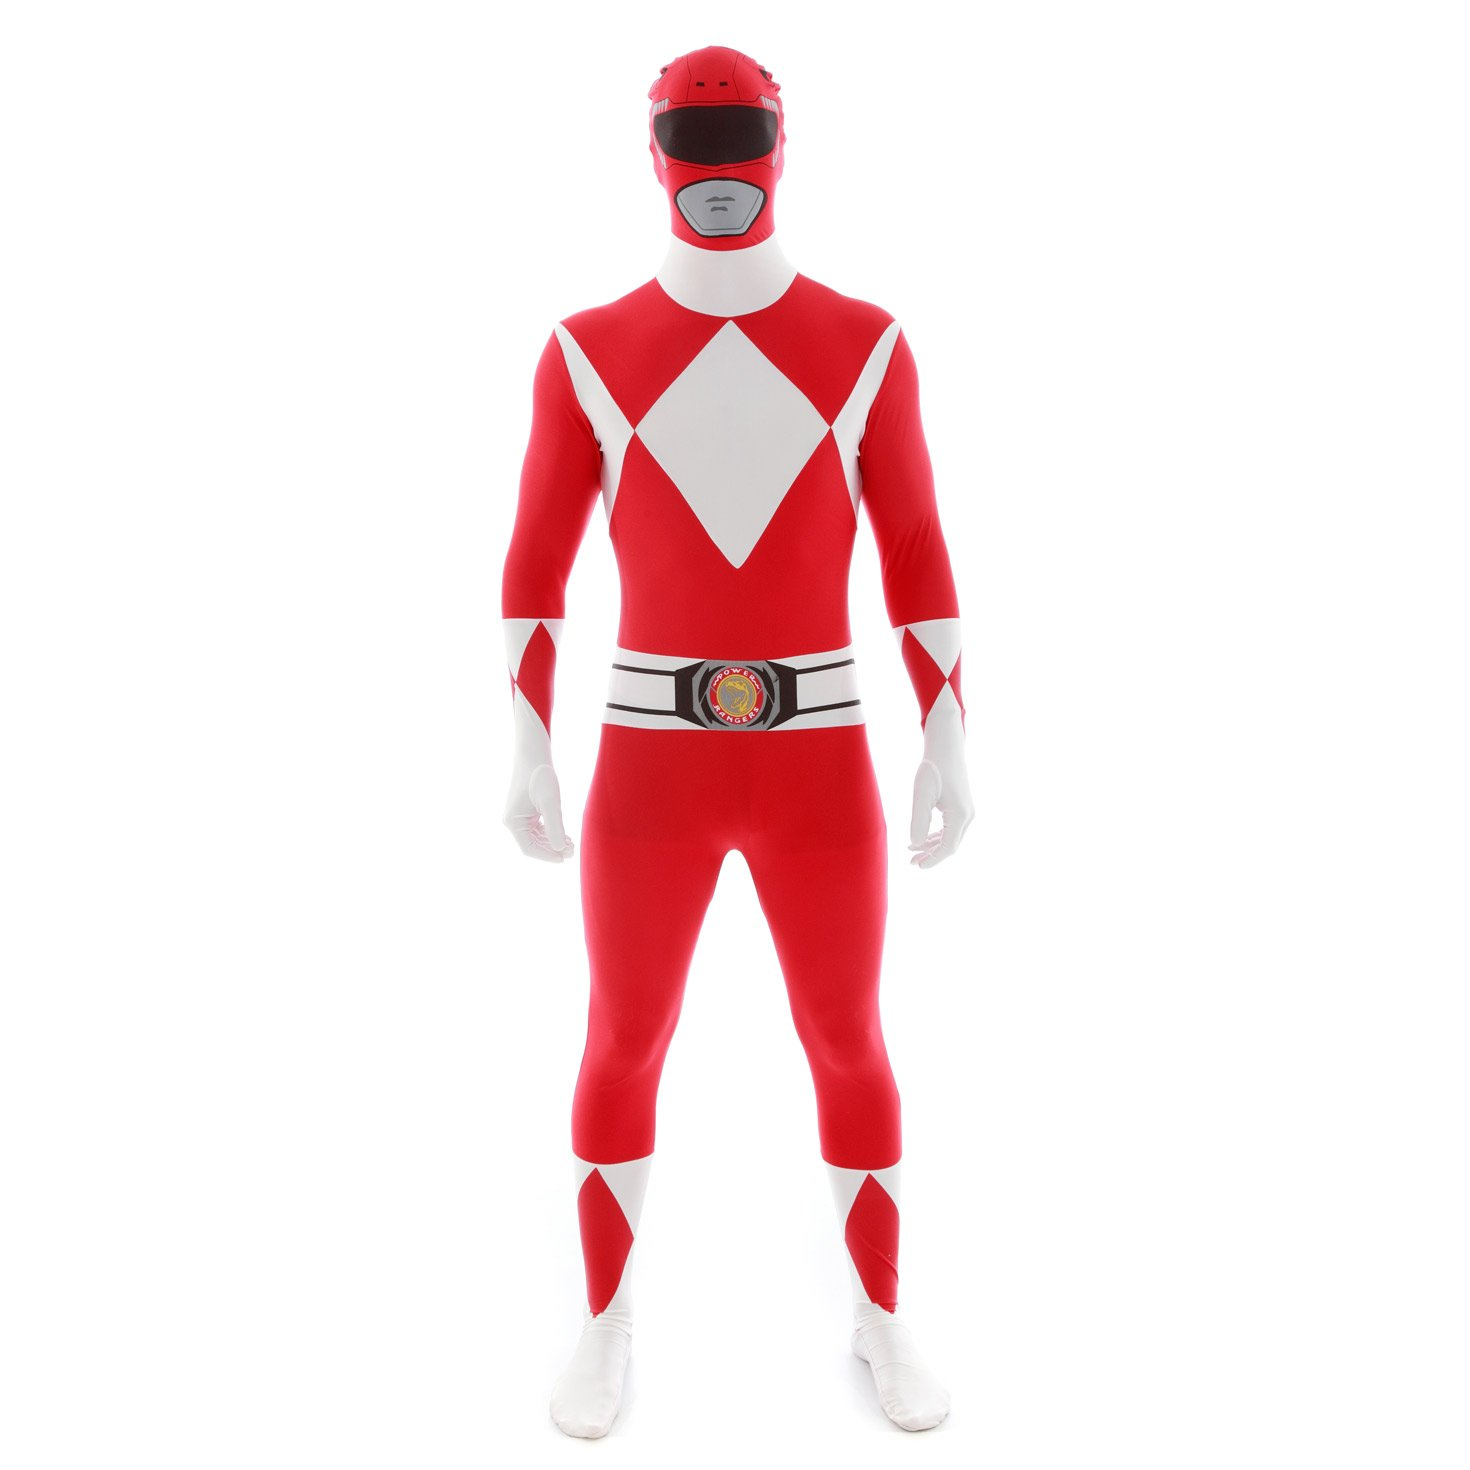 Official Power Ranger Morphsuit Costume,Red,X-Large 5'10-6'3'' (177cm - 190cm)